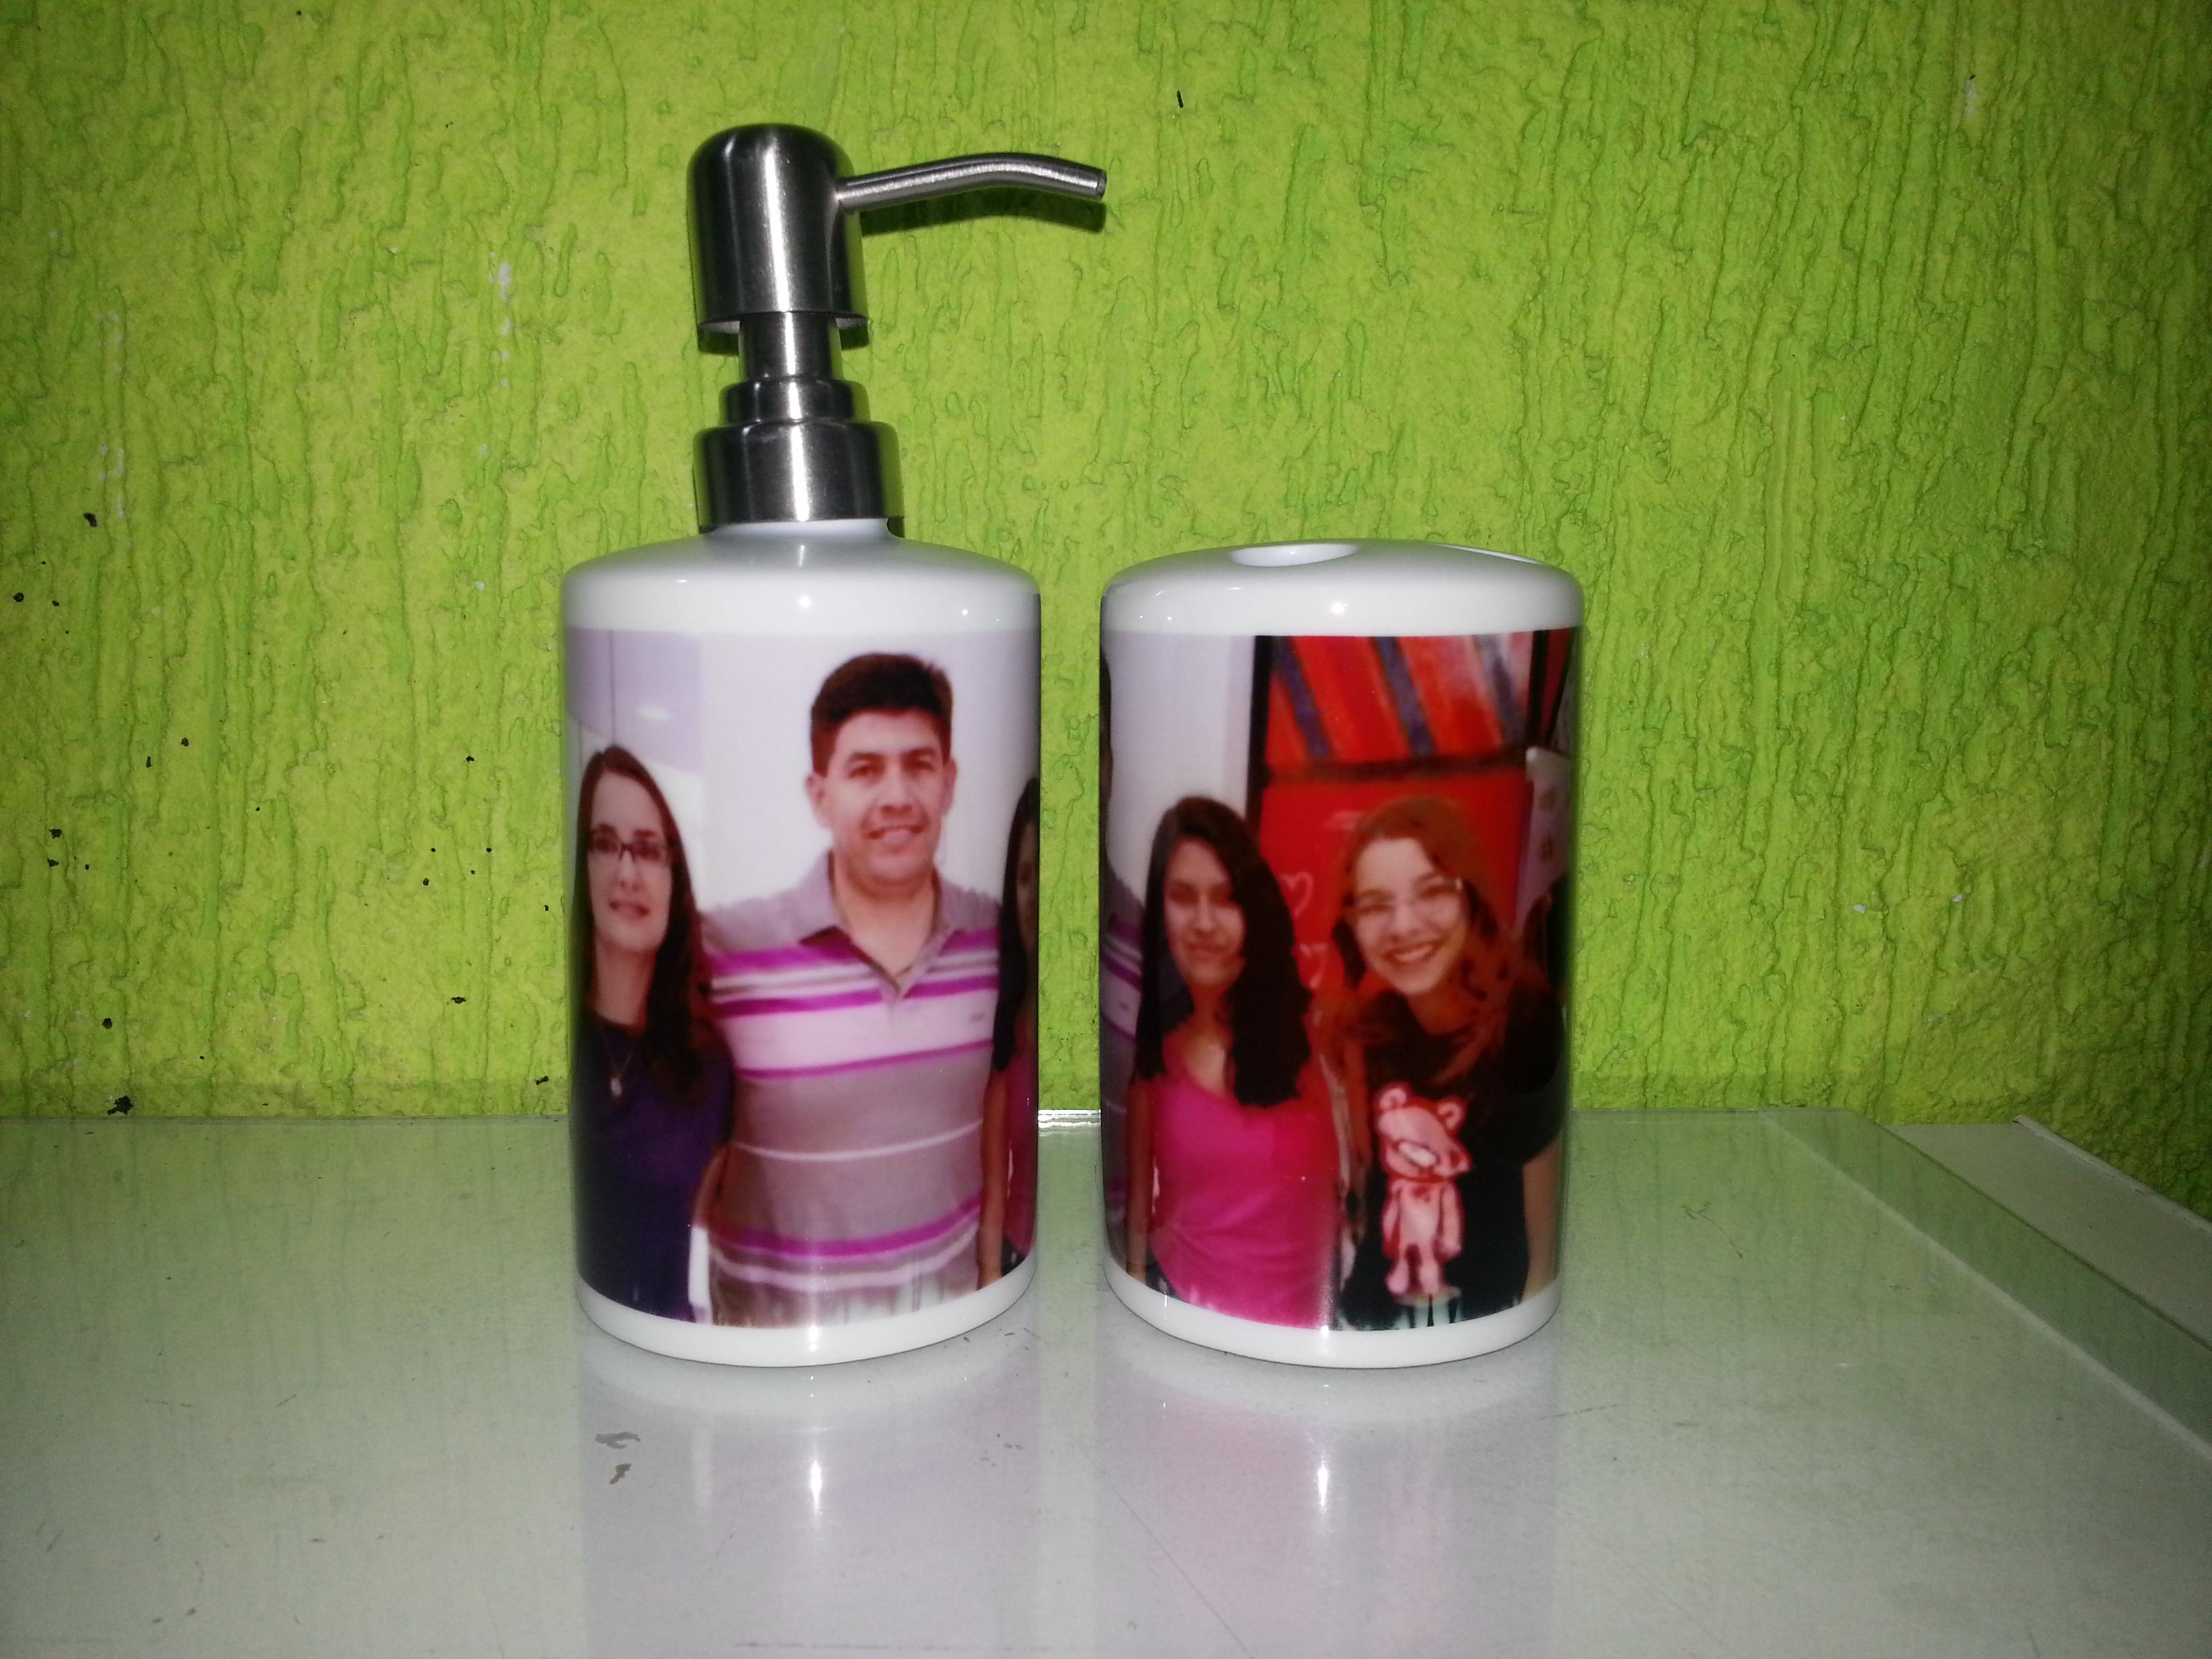 kit saboneteira porcelana personalizada kit banheiro #4C611A 3264 2448